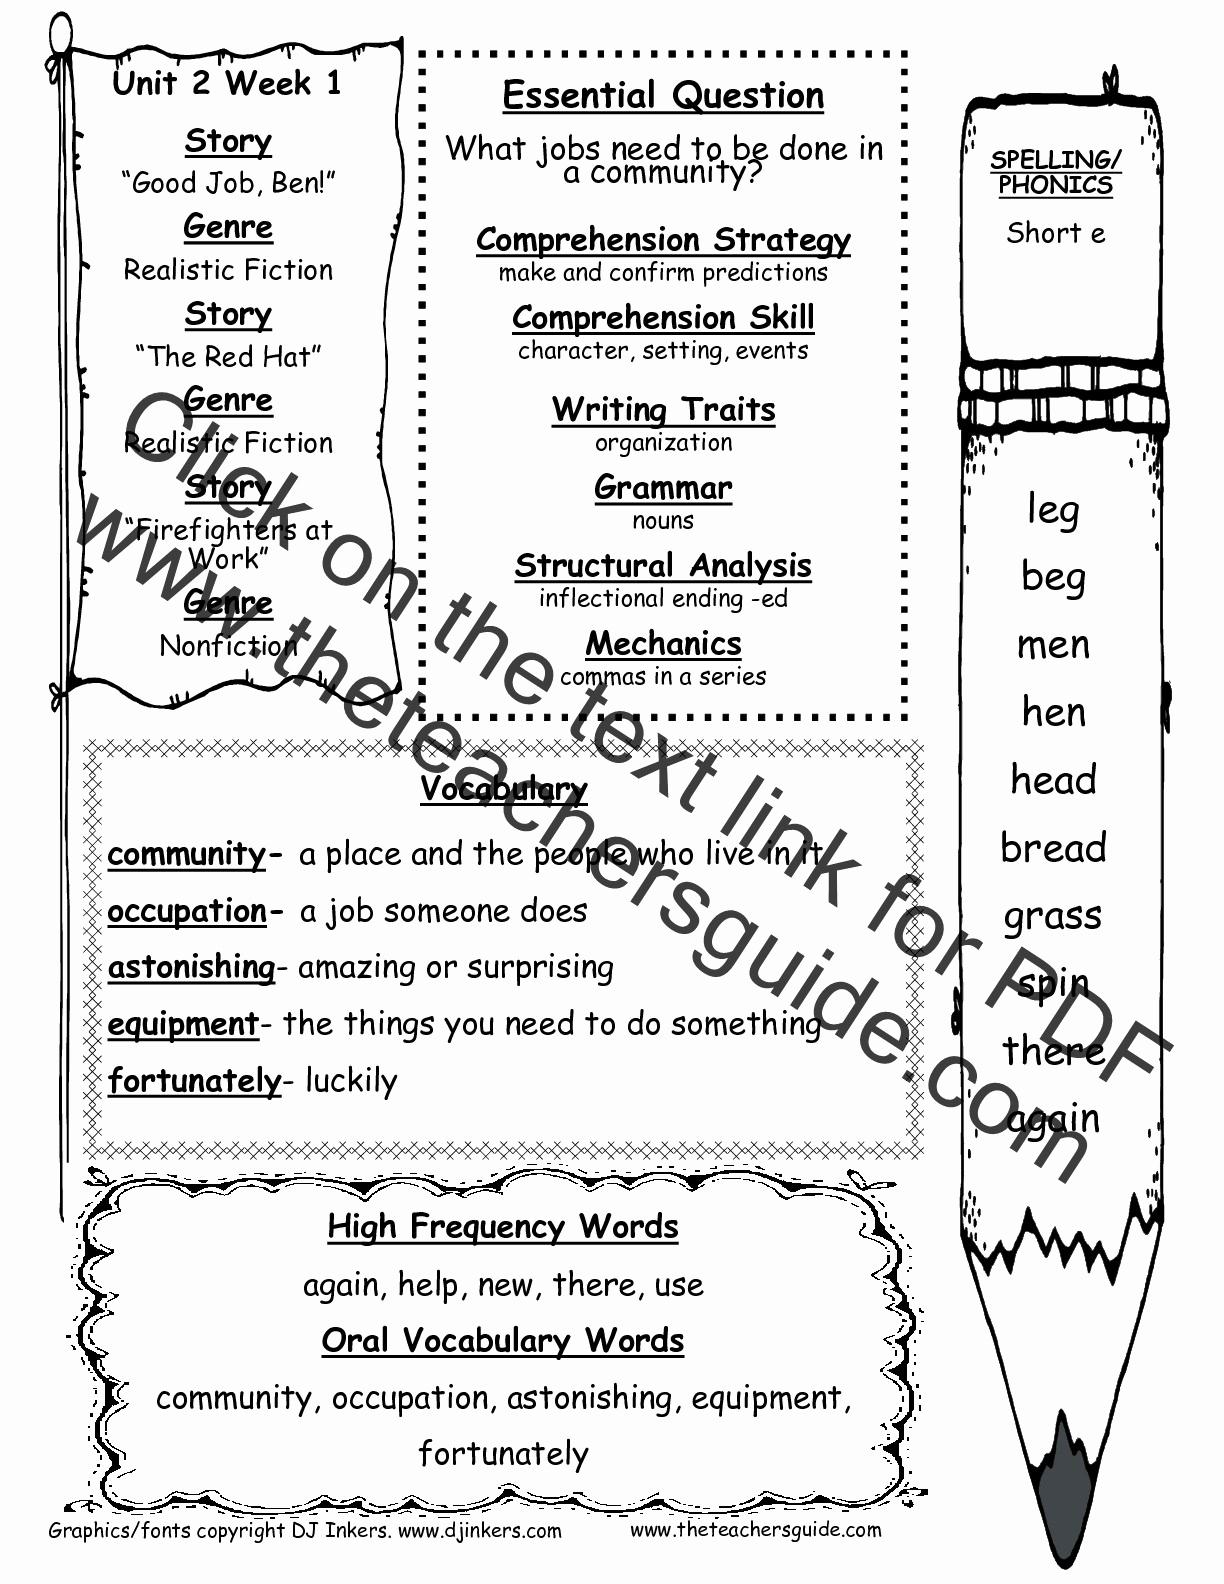 Predictions Worksheets 1st Grade Lovely 20 Predictions Worksheets 1st Grade